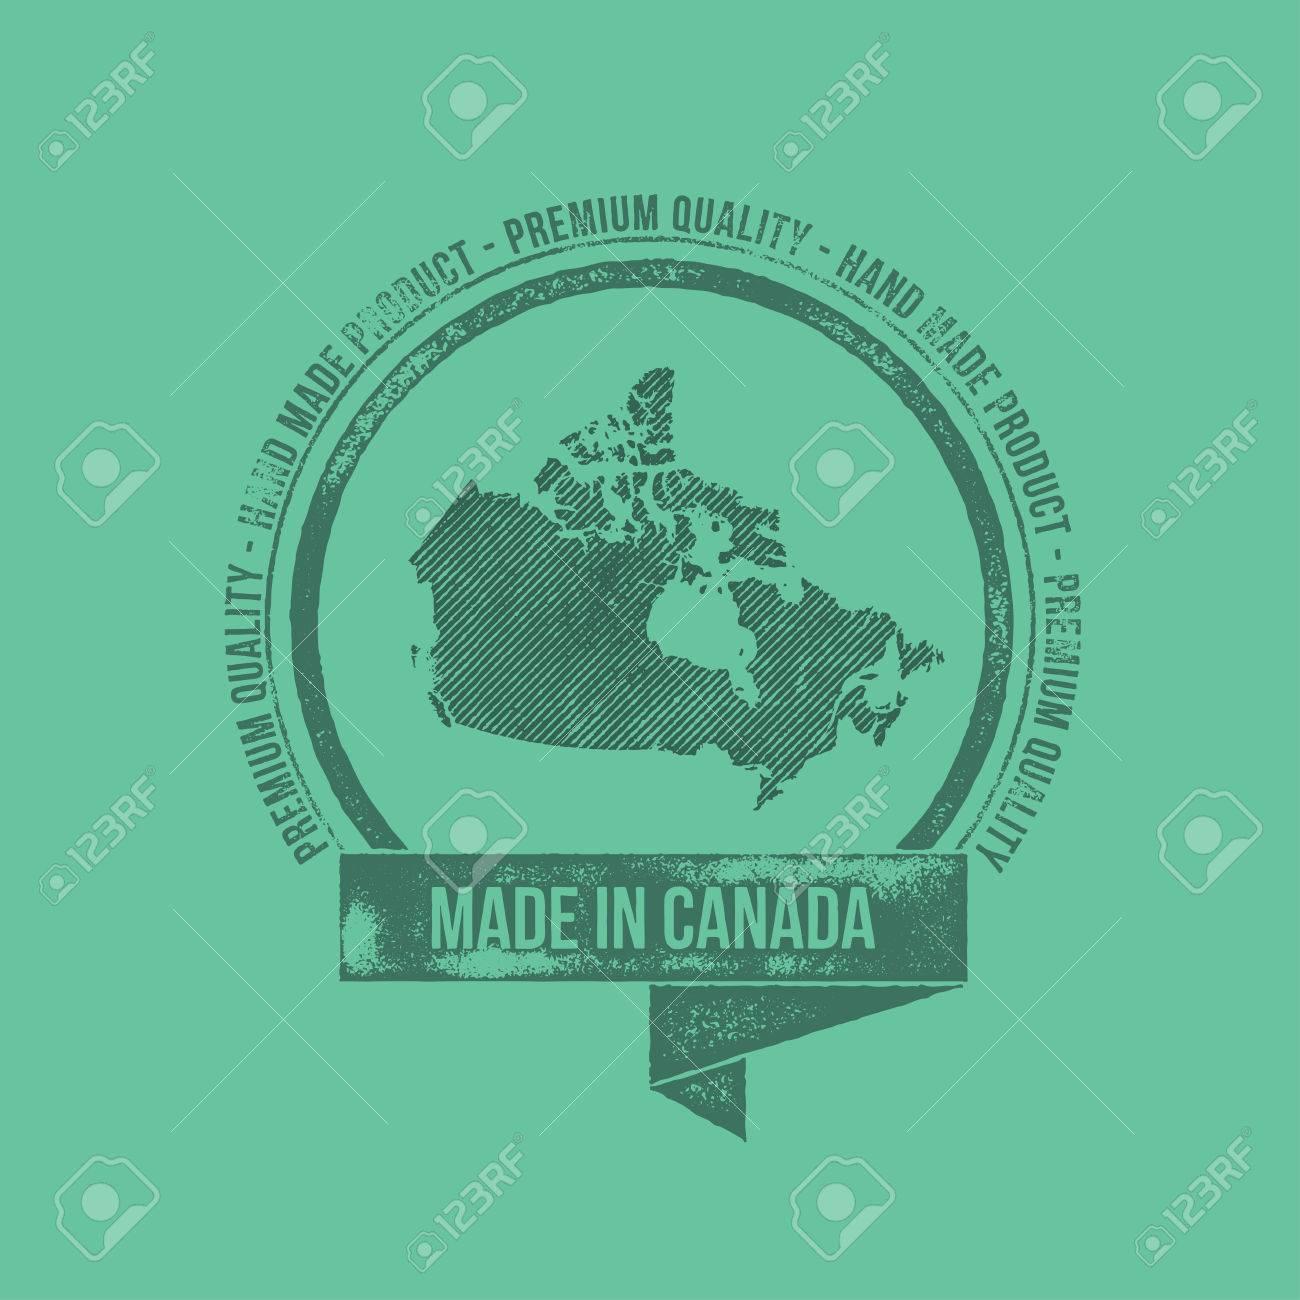 Shirt design canada - Made In Canada Retro Vintage Dirty Badge Label T Shirt Design Hand Made